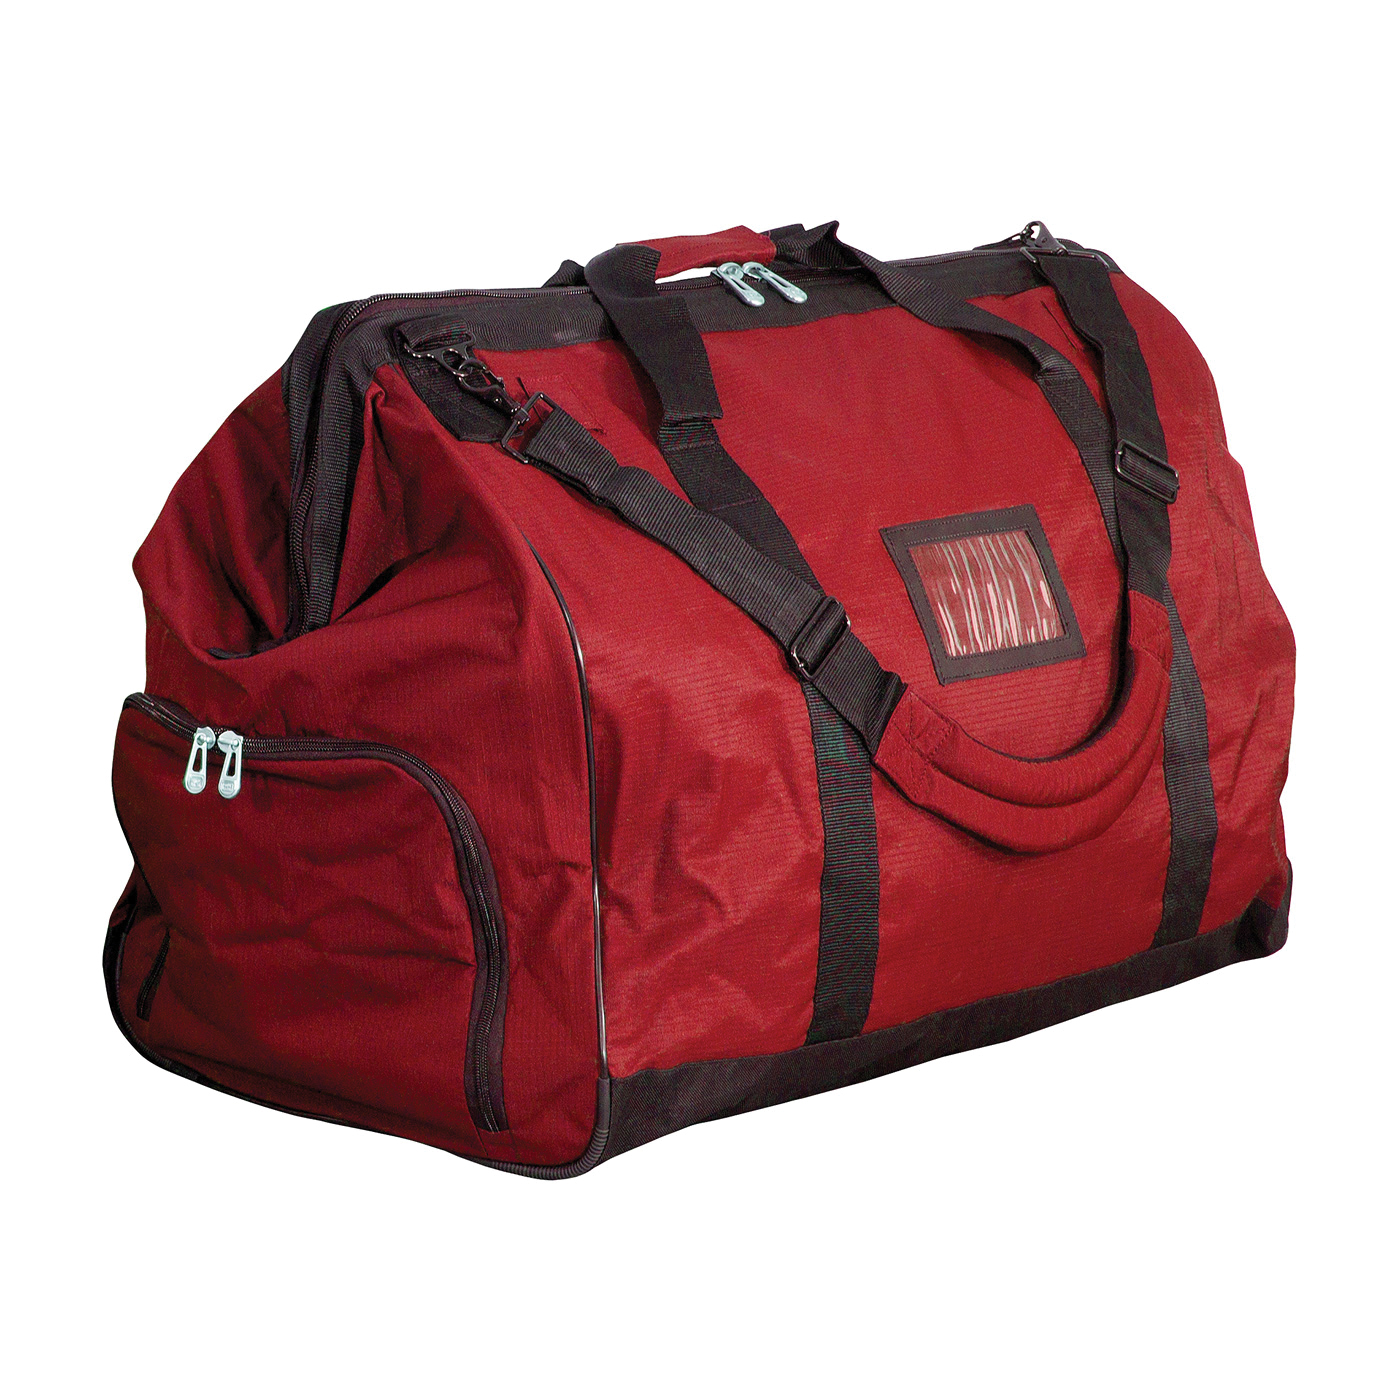 PIP® 903-GB651 Gear Bag, Red, Polyester, 22 in H x 16-1/2 in W x 28 in D